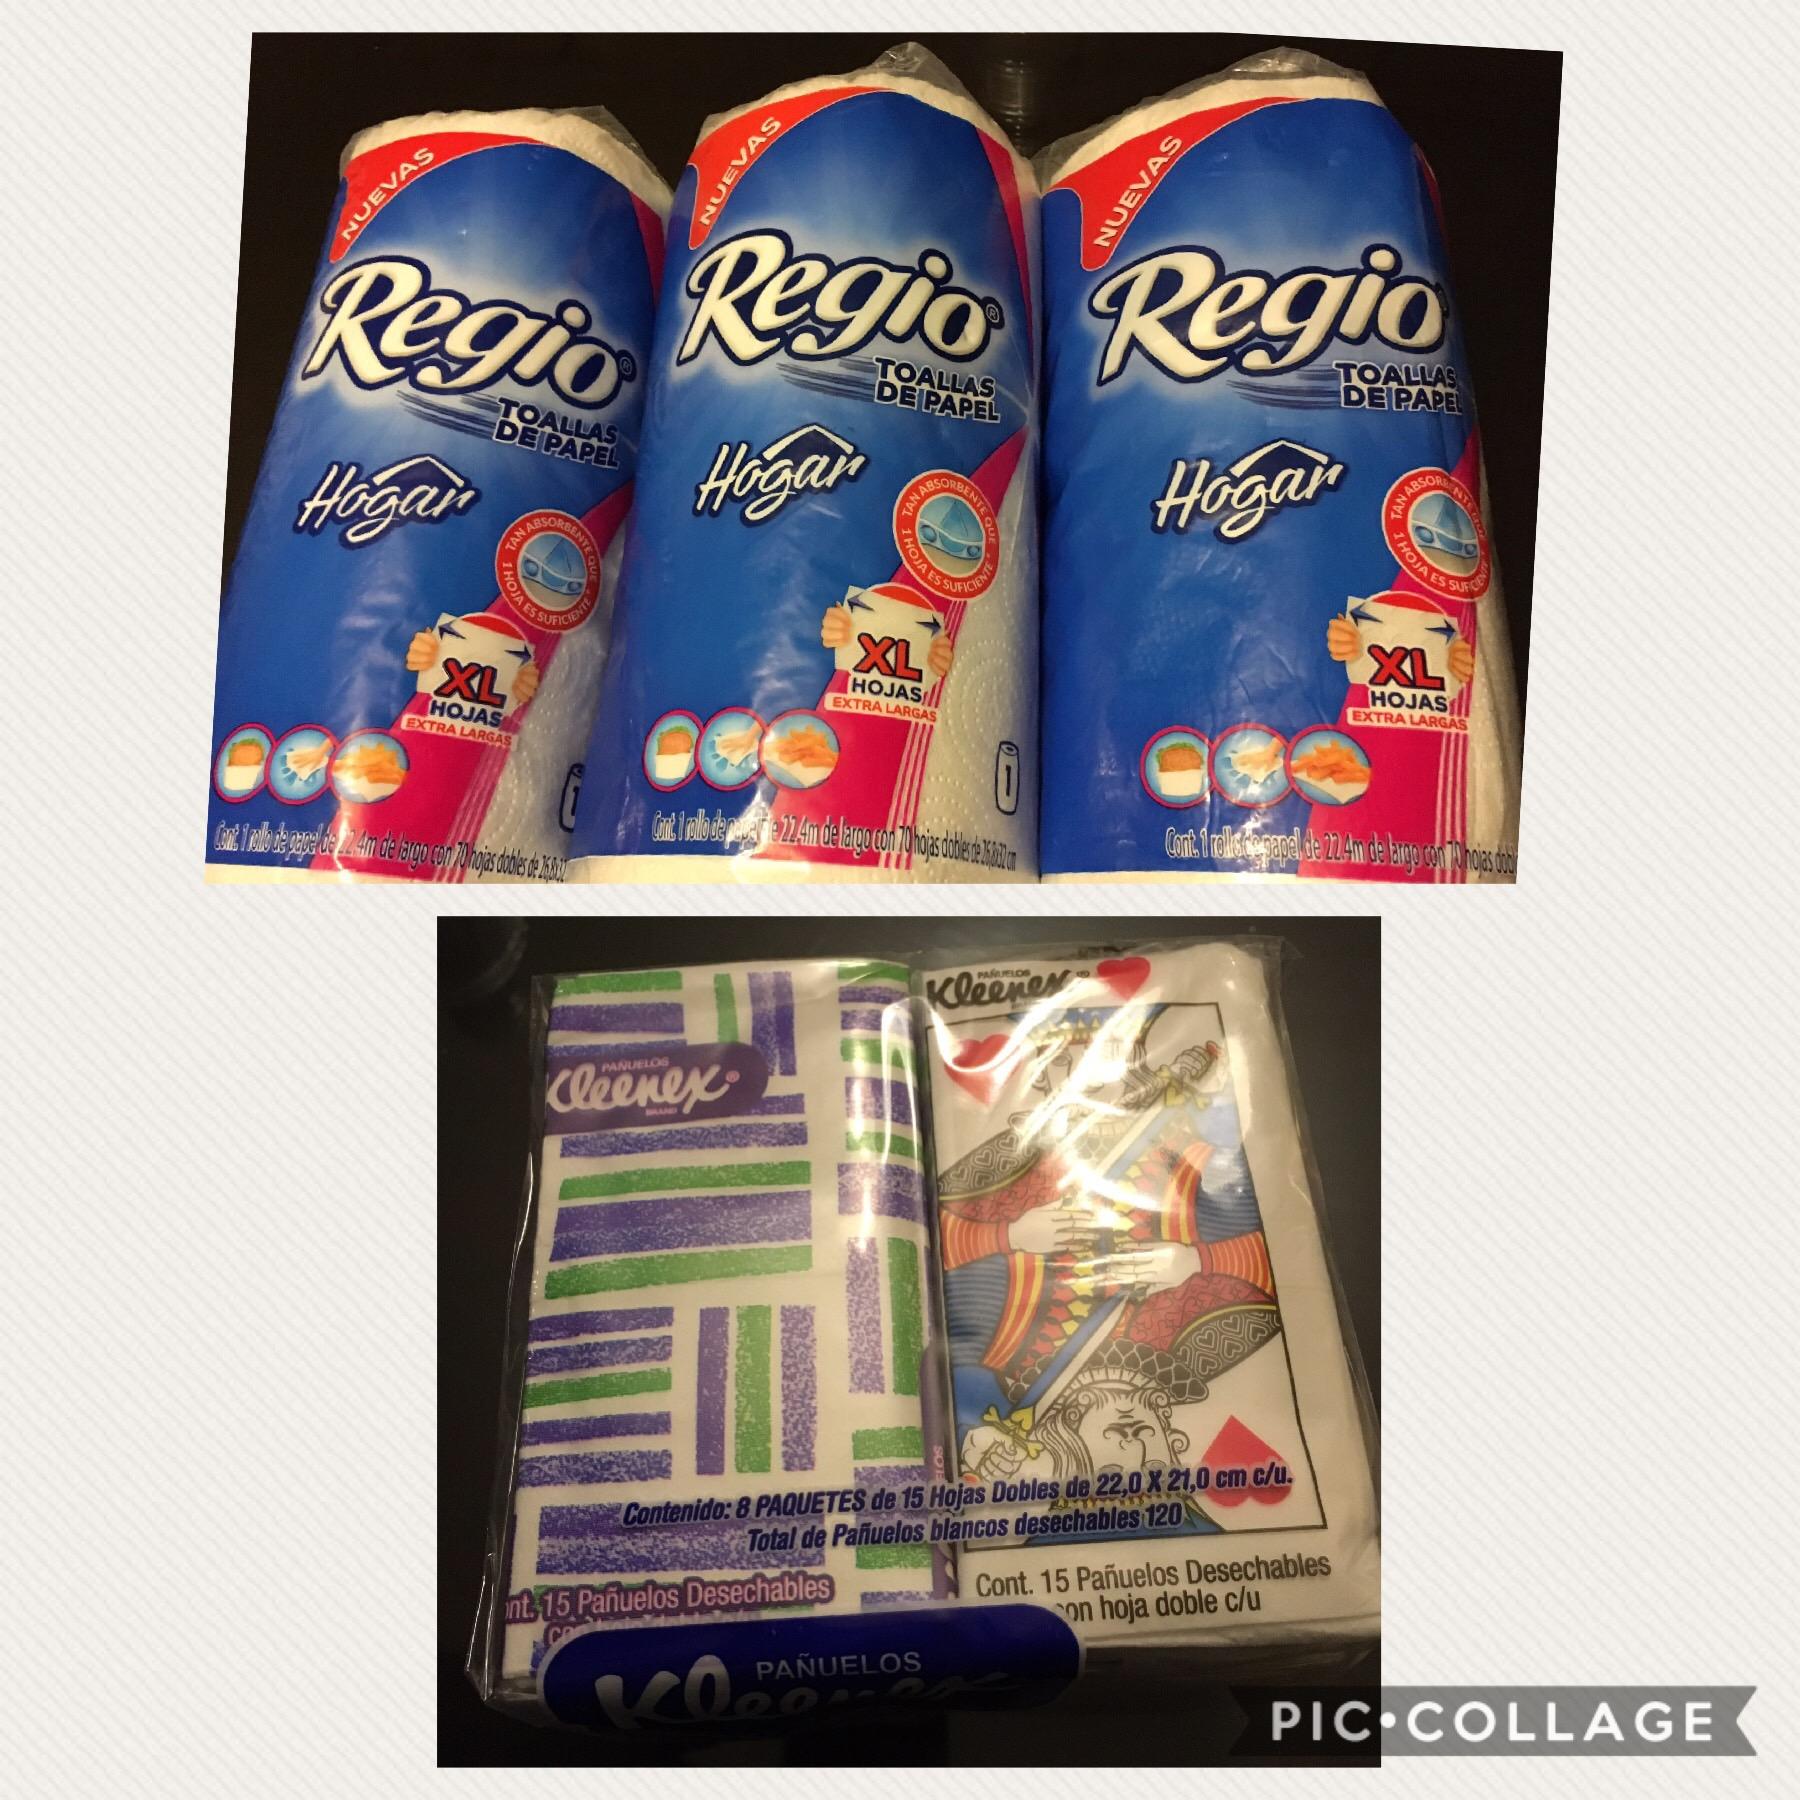 Walmart Toluca EDOMEX: servitoallas REGIO y paq. 8 Kleenex en $5.02, lata kitty $35.03